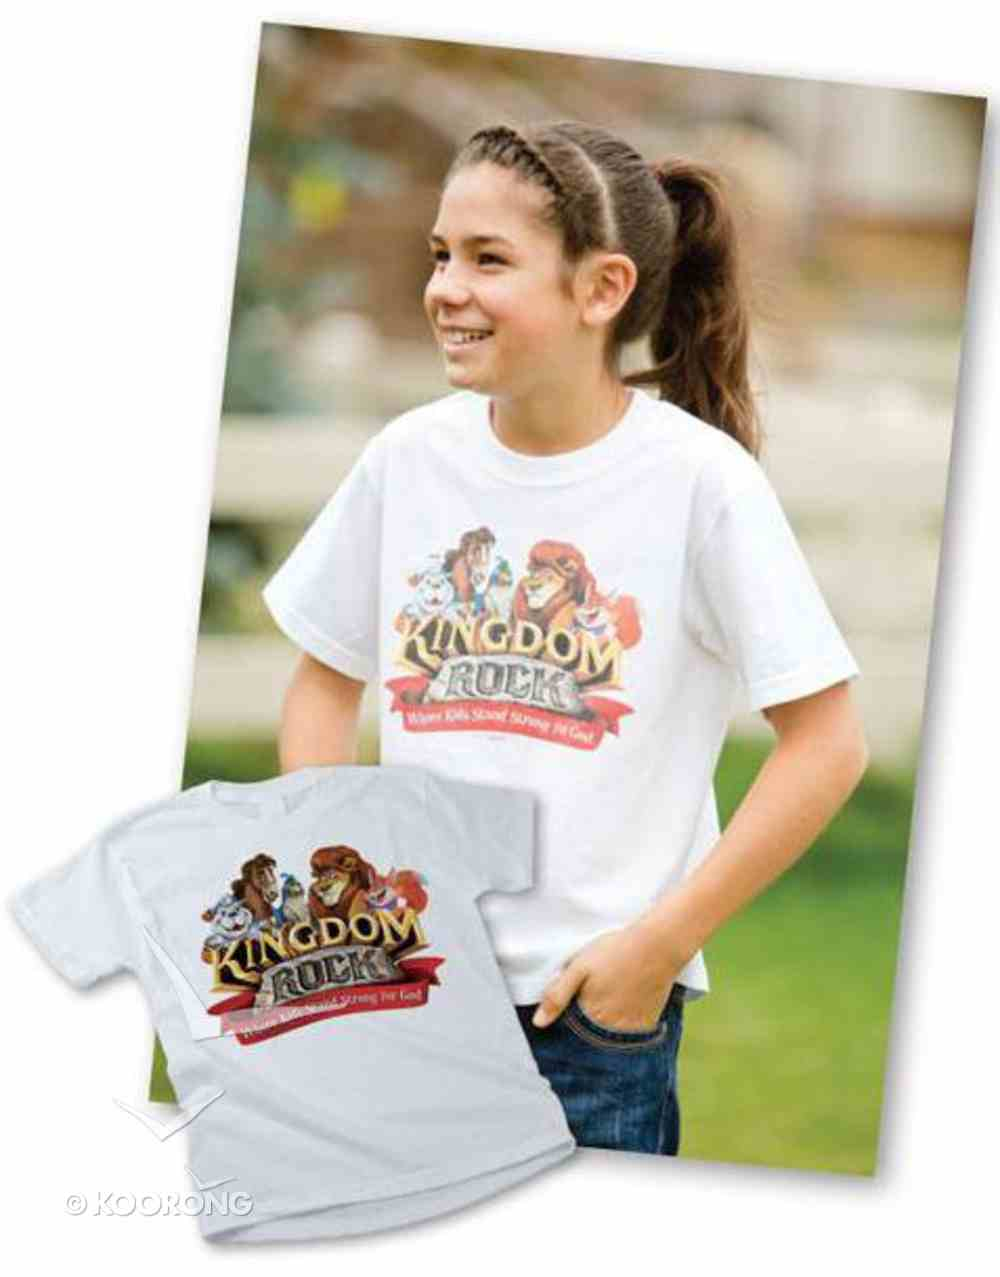 Child Kingdom Rock T-Shirt Med (10-12) (Kingdom Rock Series) Soft Goods